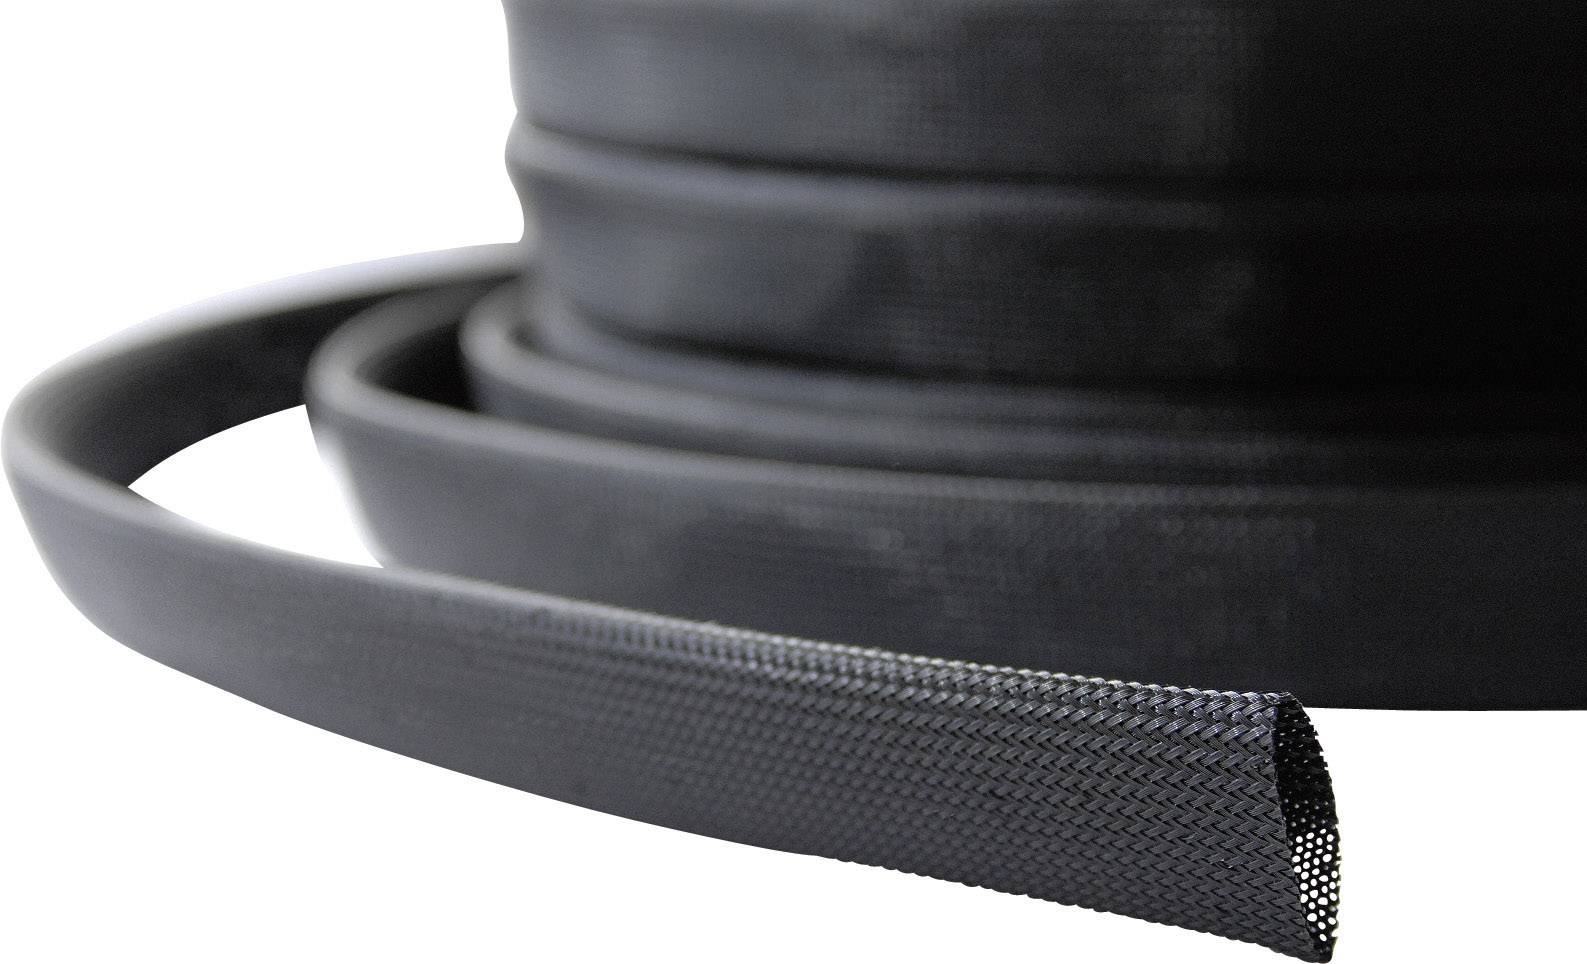 Ochranný oplet LappKabel SILVYN® BRAID PA6 NW, 14 do 24 mm, -55 do +125 °C, 15 m, čierna